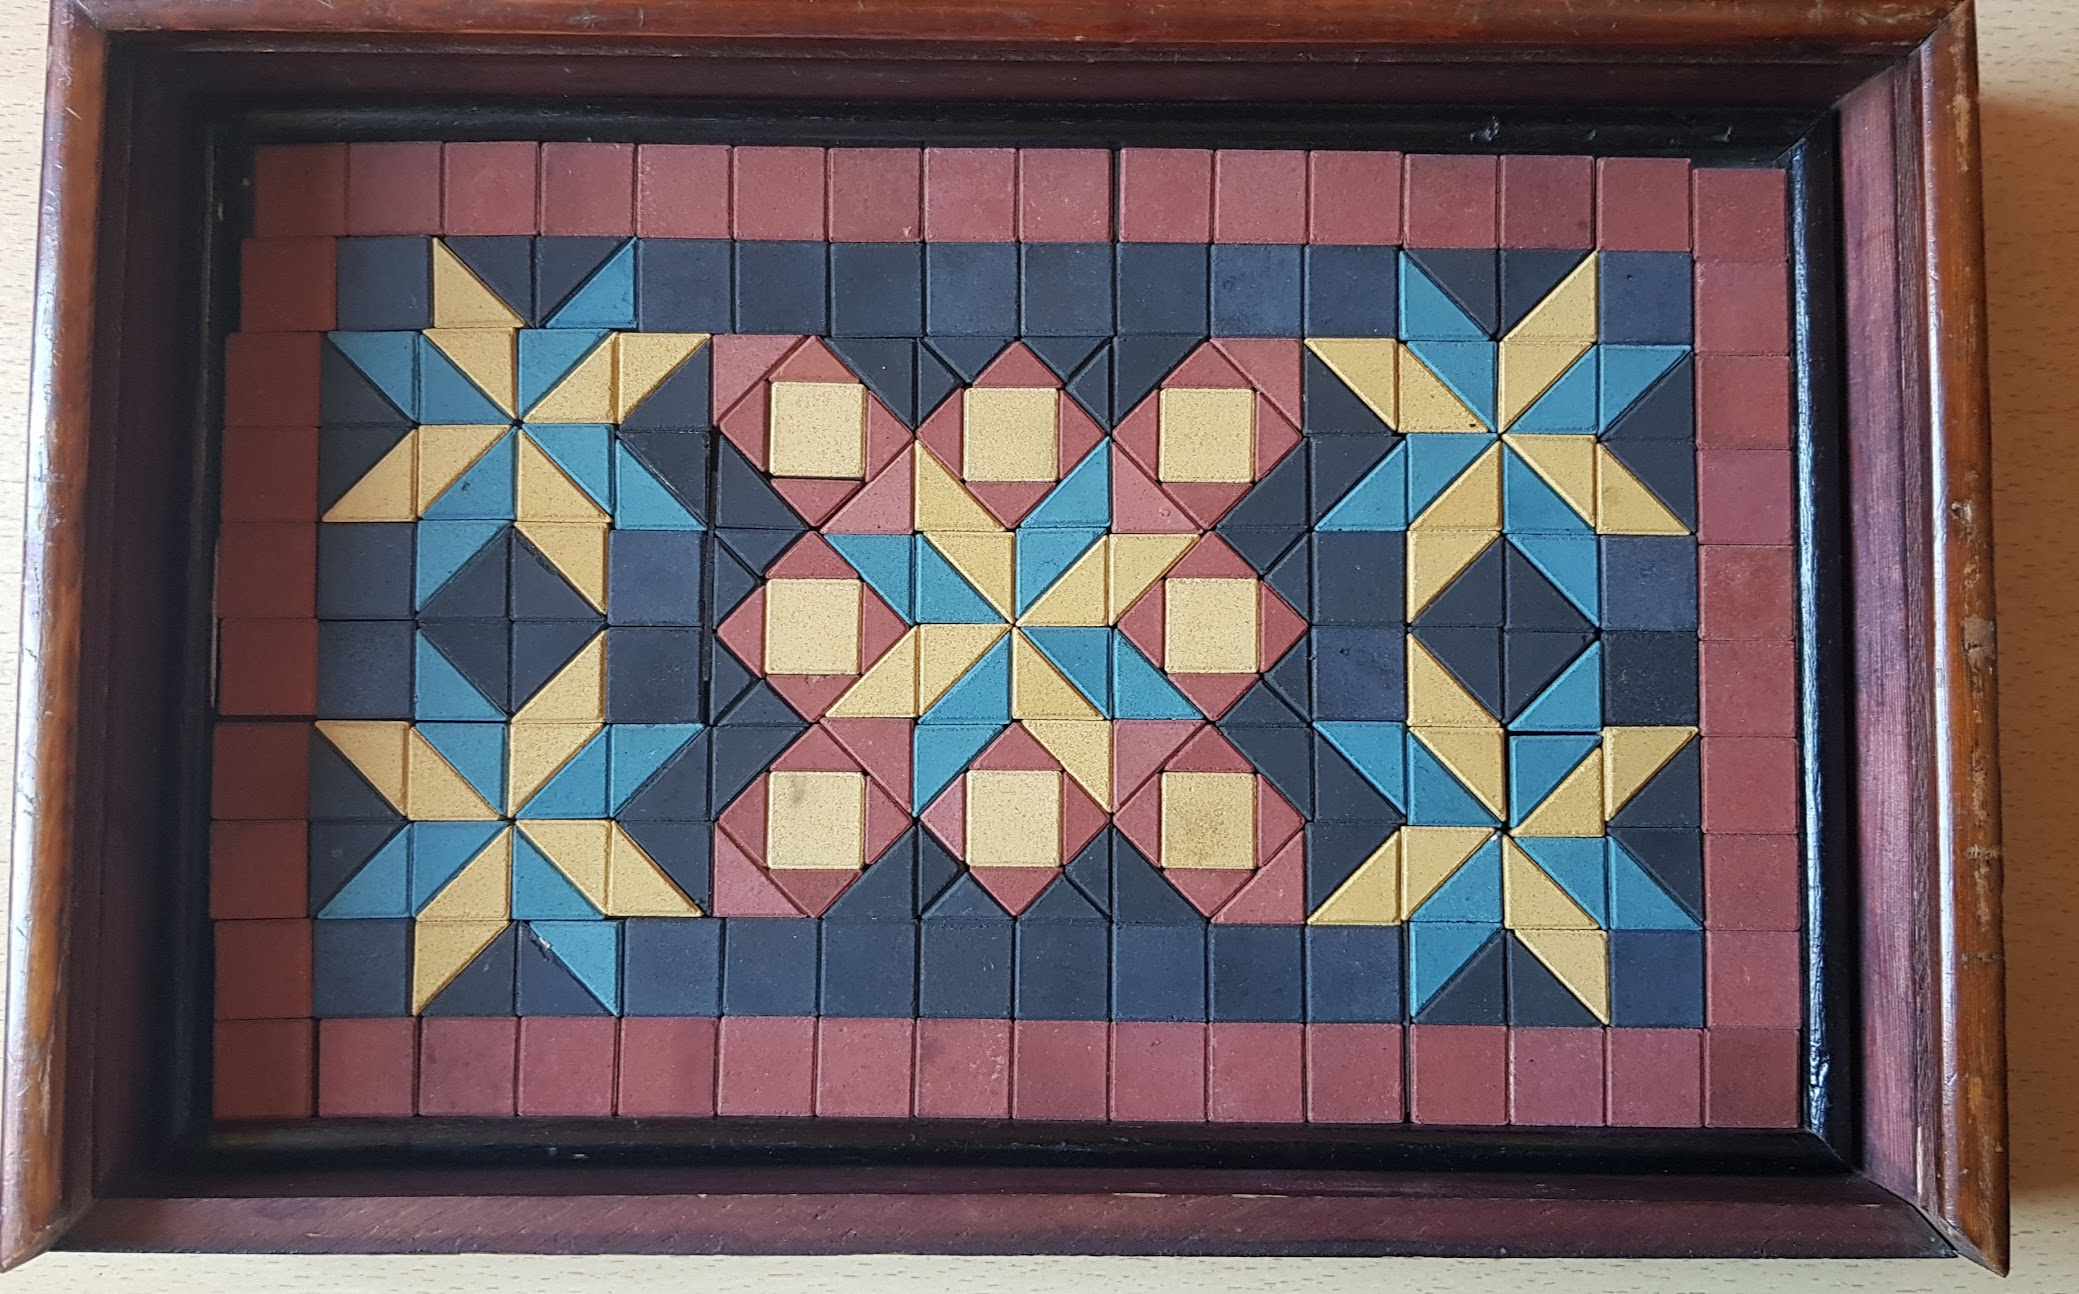 F. Ad. Richter - Anker Baukasten Mosaik No. 2 - 2. Lage